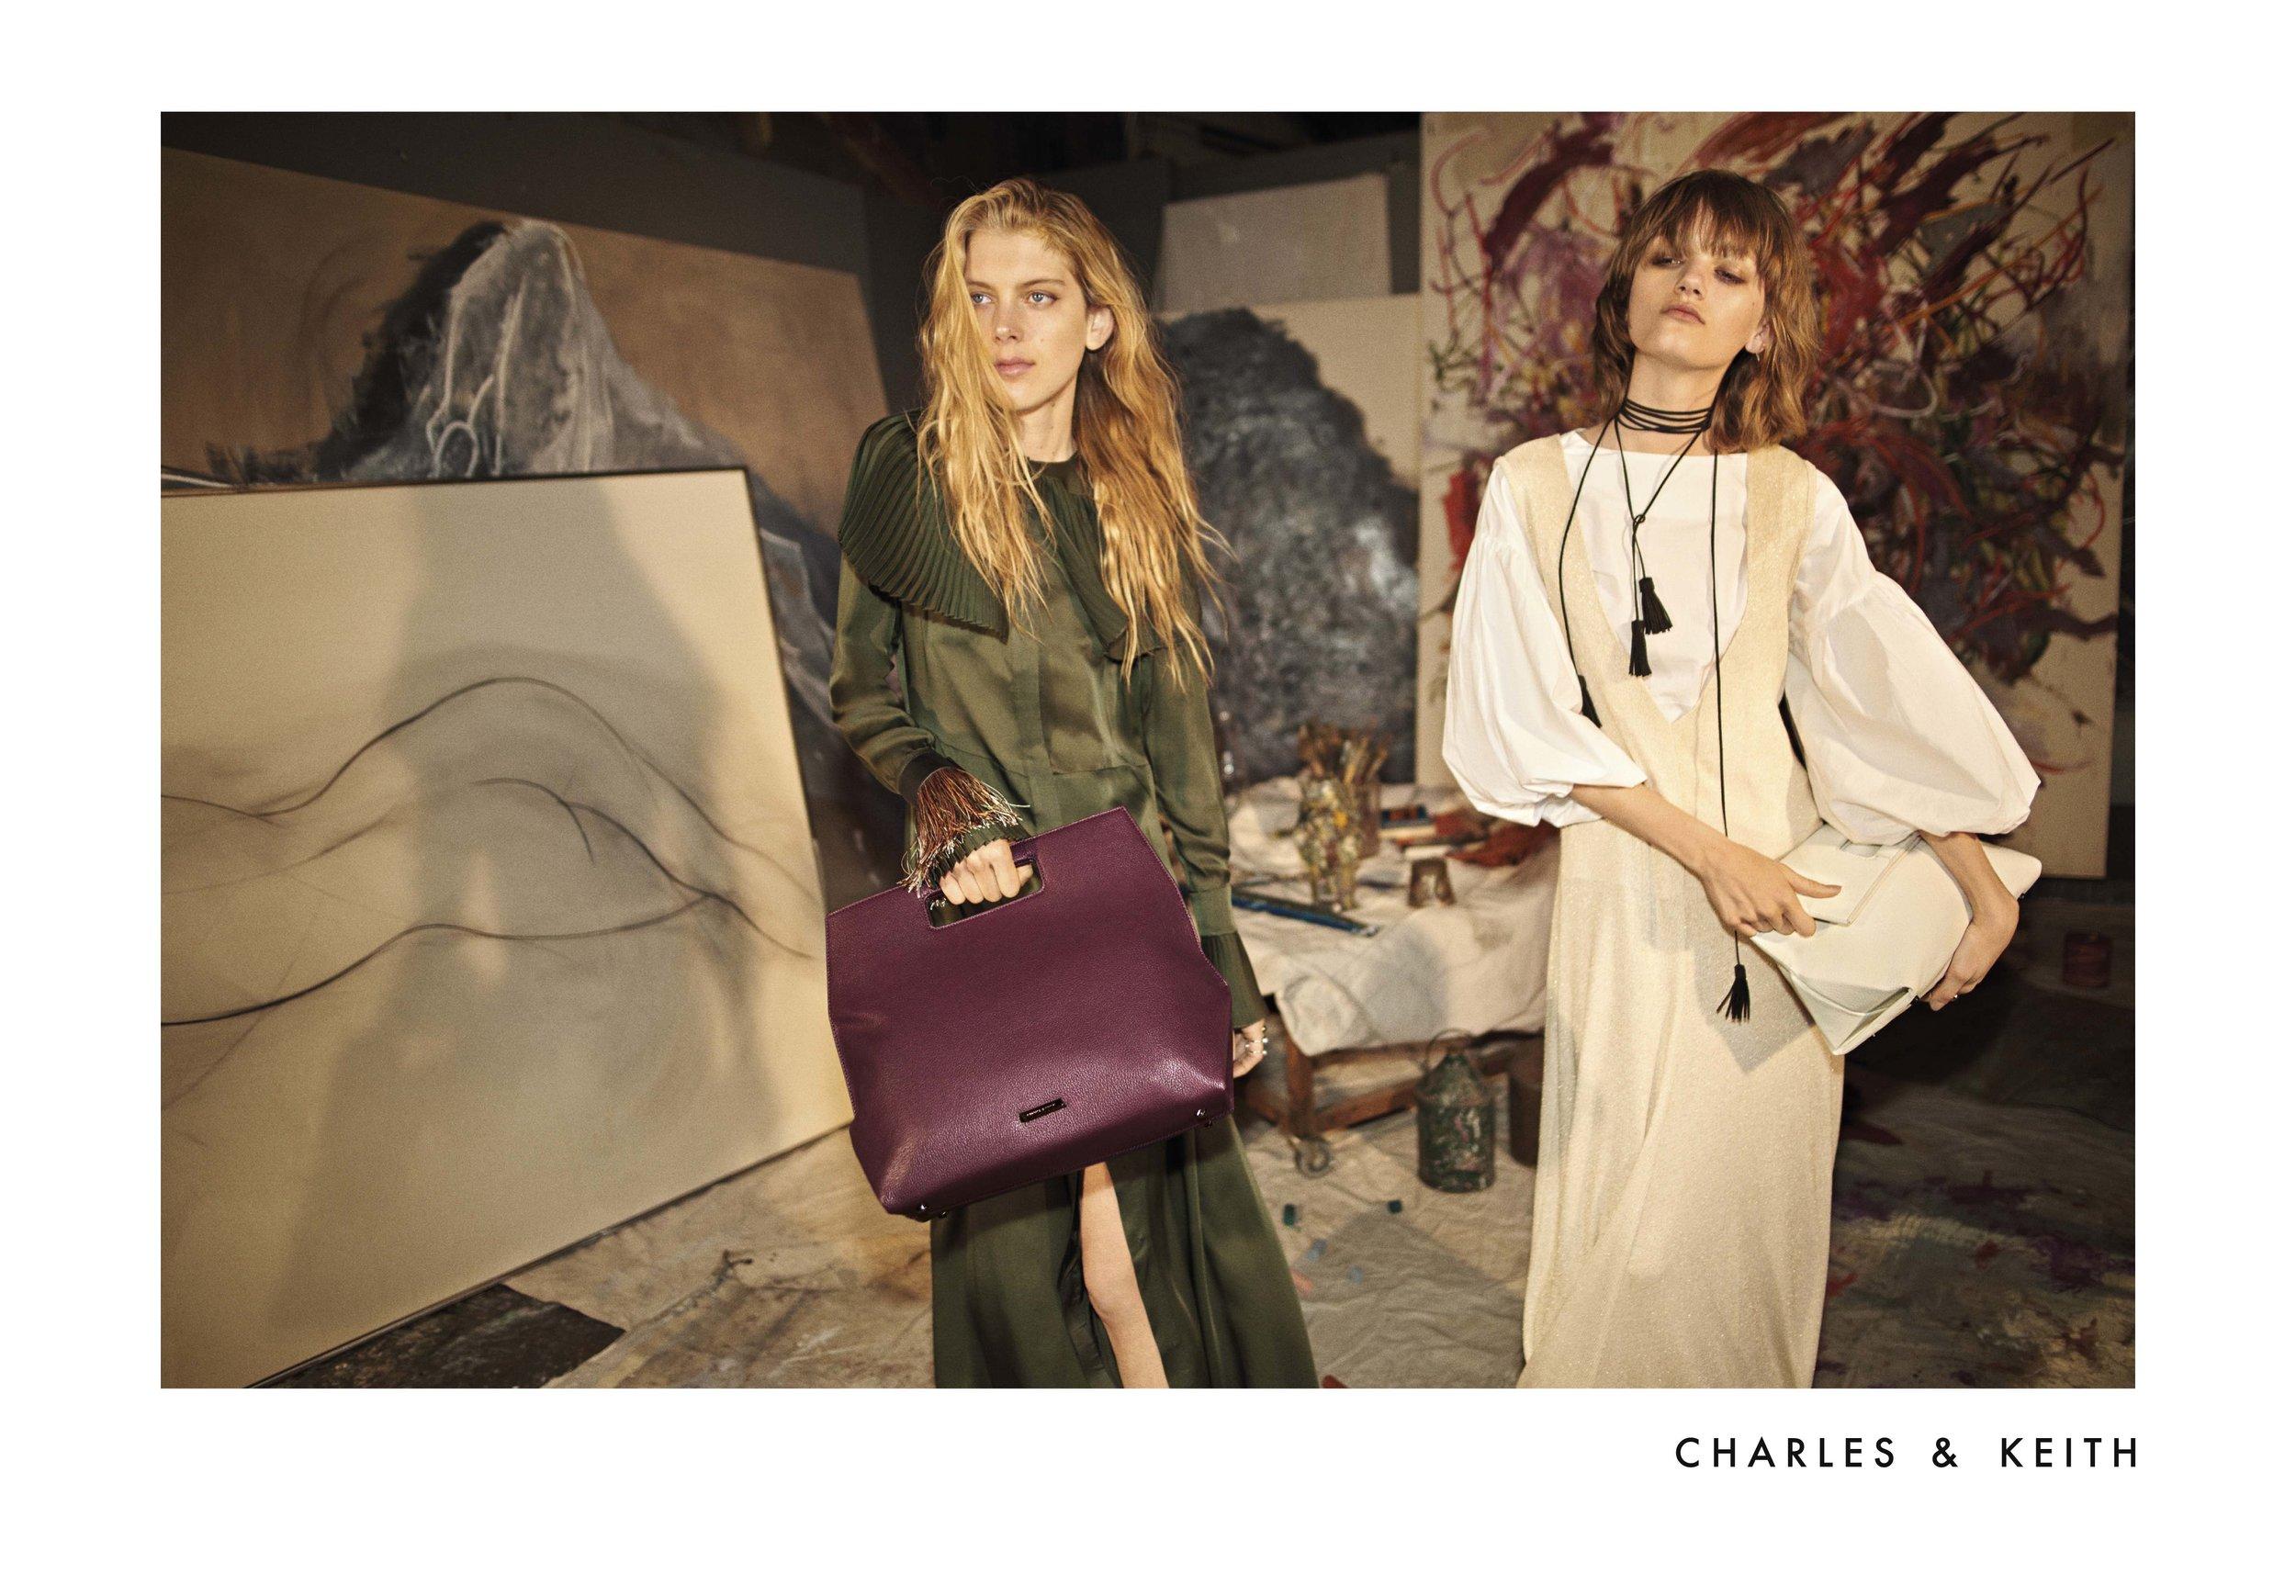 CHARLES & KEITH_Spring Summer 2017_Advertisement (1).JPG